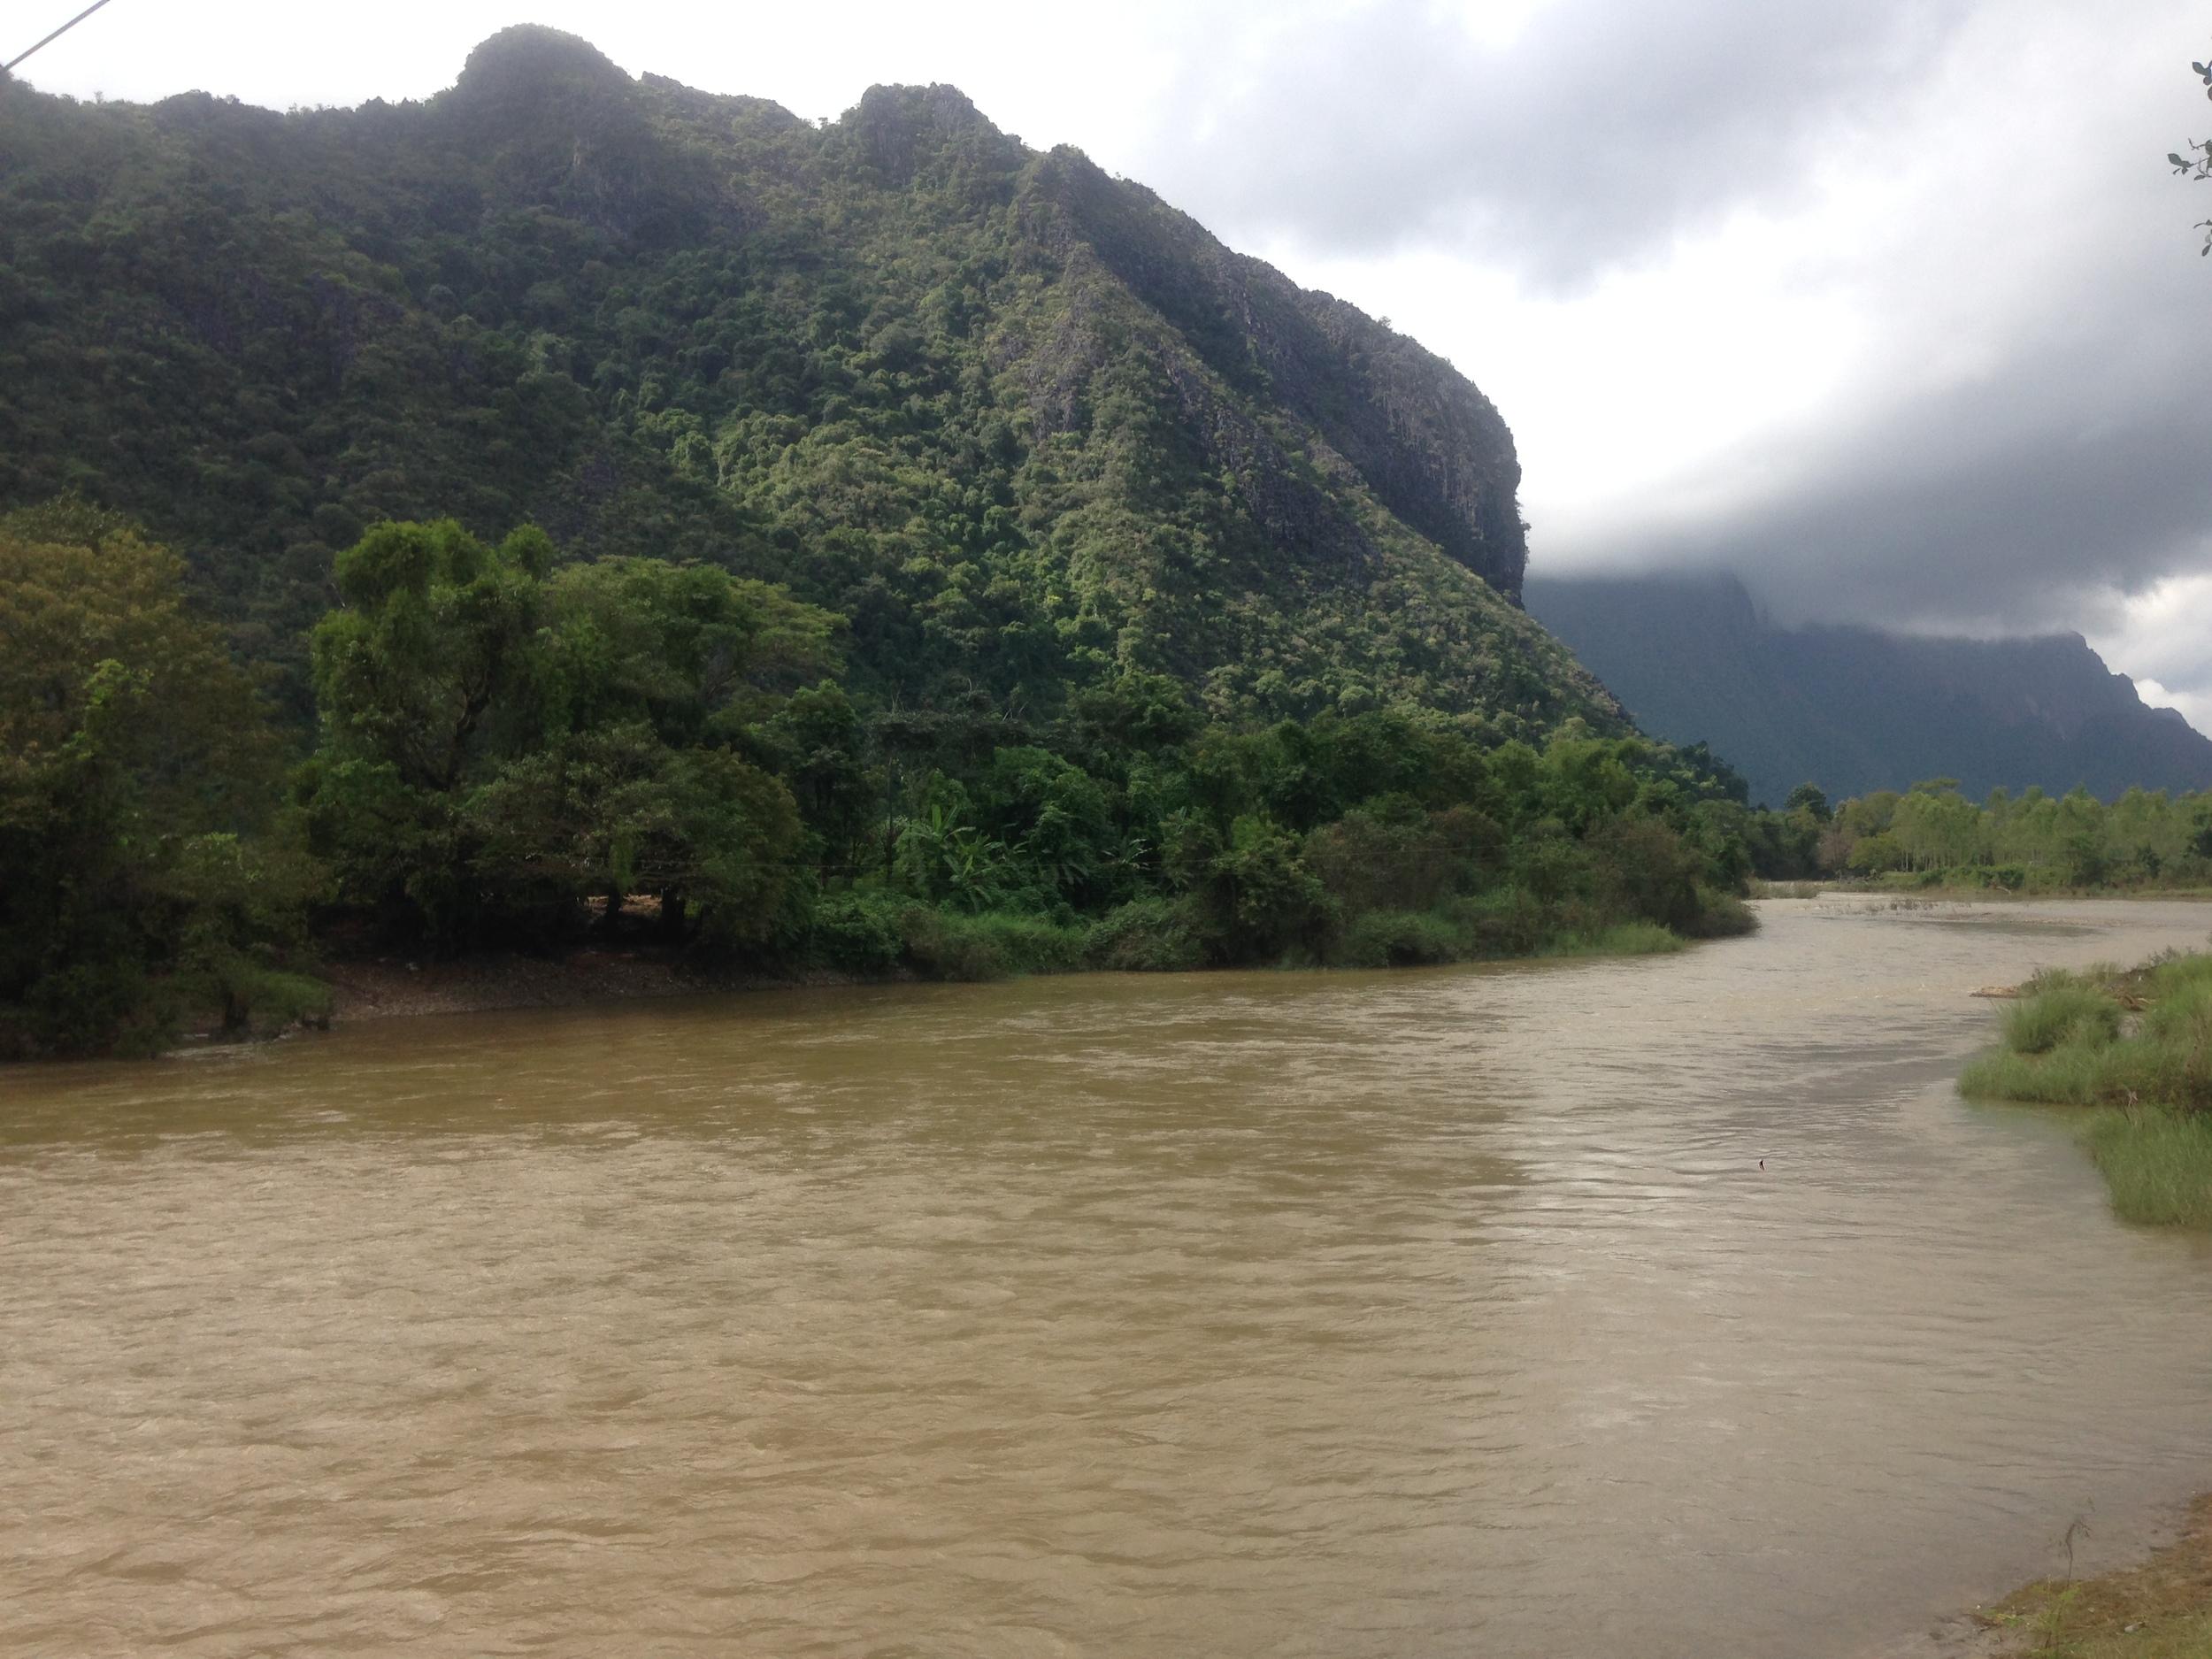 The Mekong in Vang Vieng